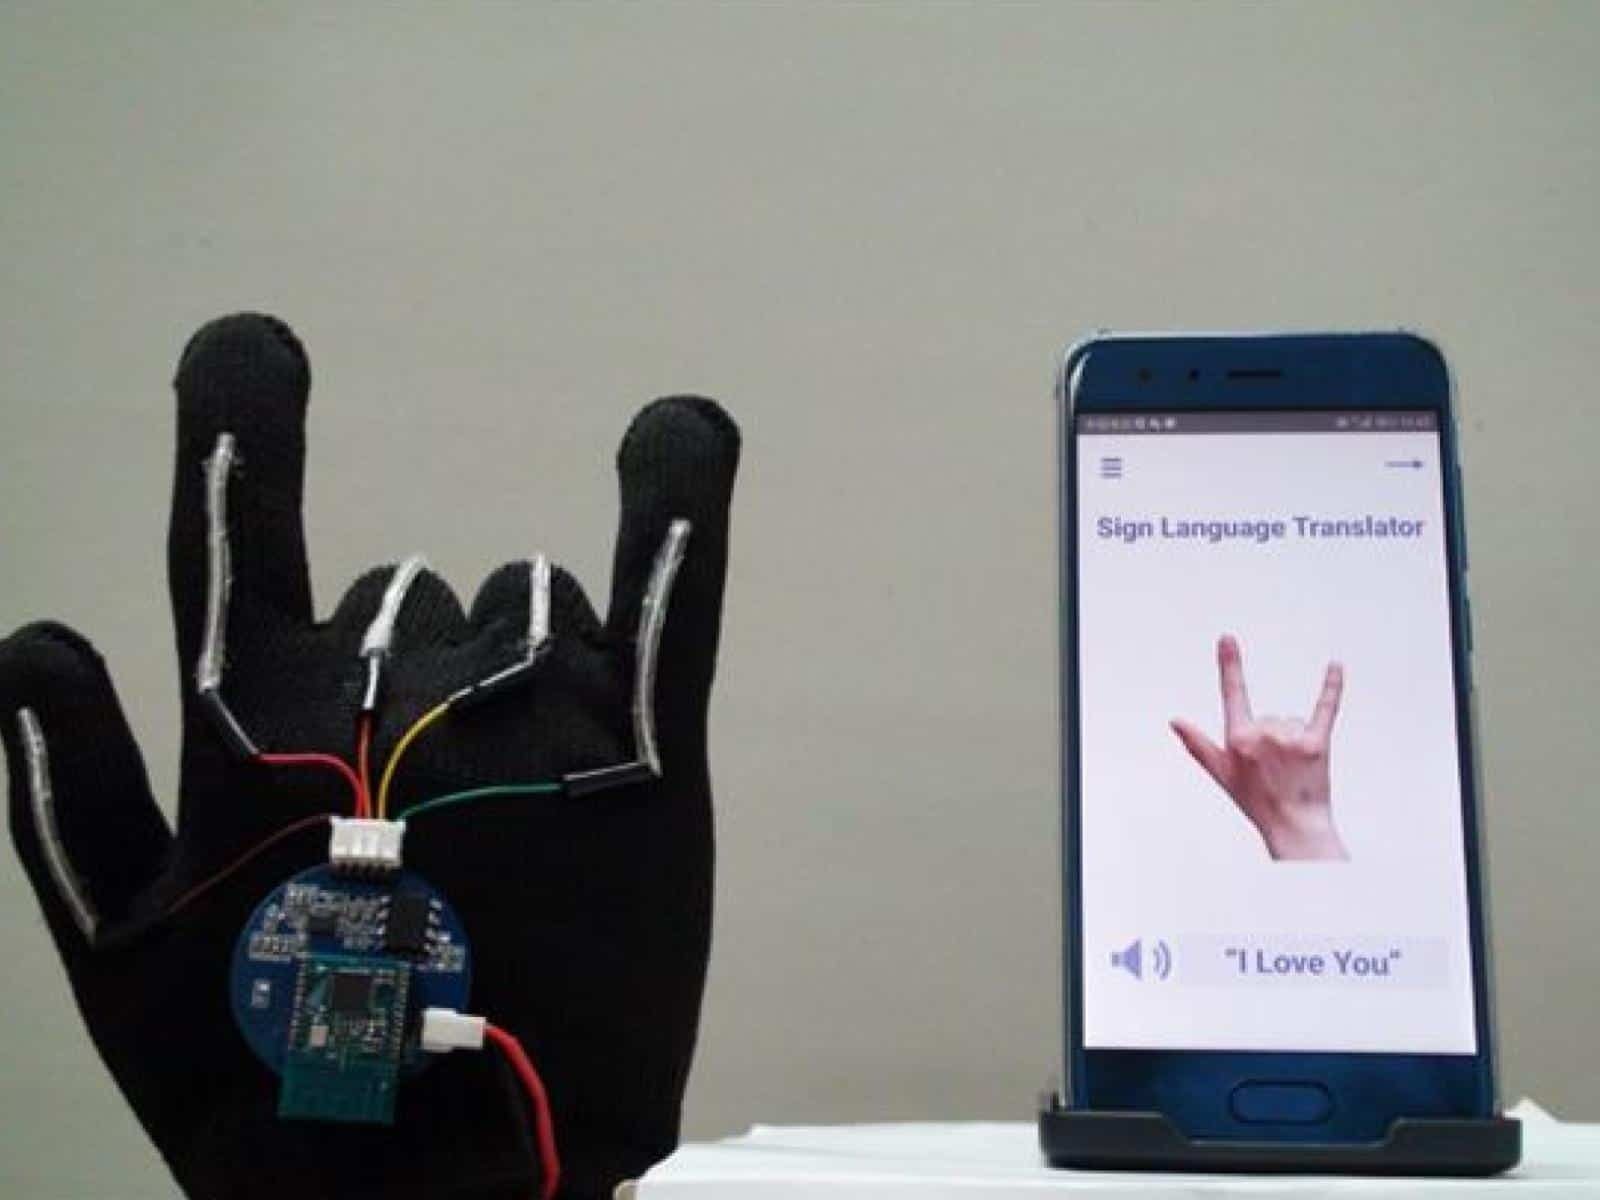 UCLA ASL sign language translating gloves